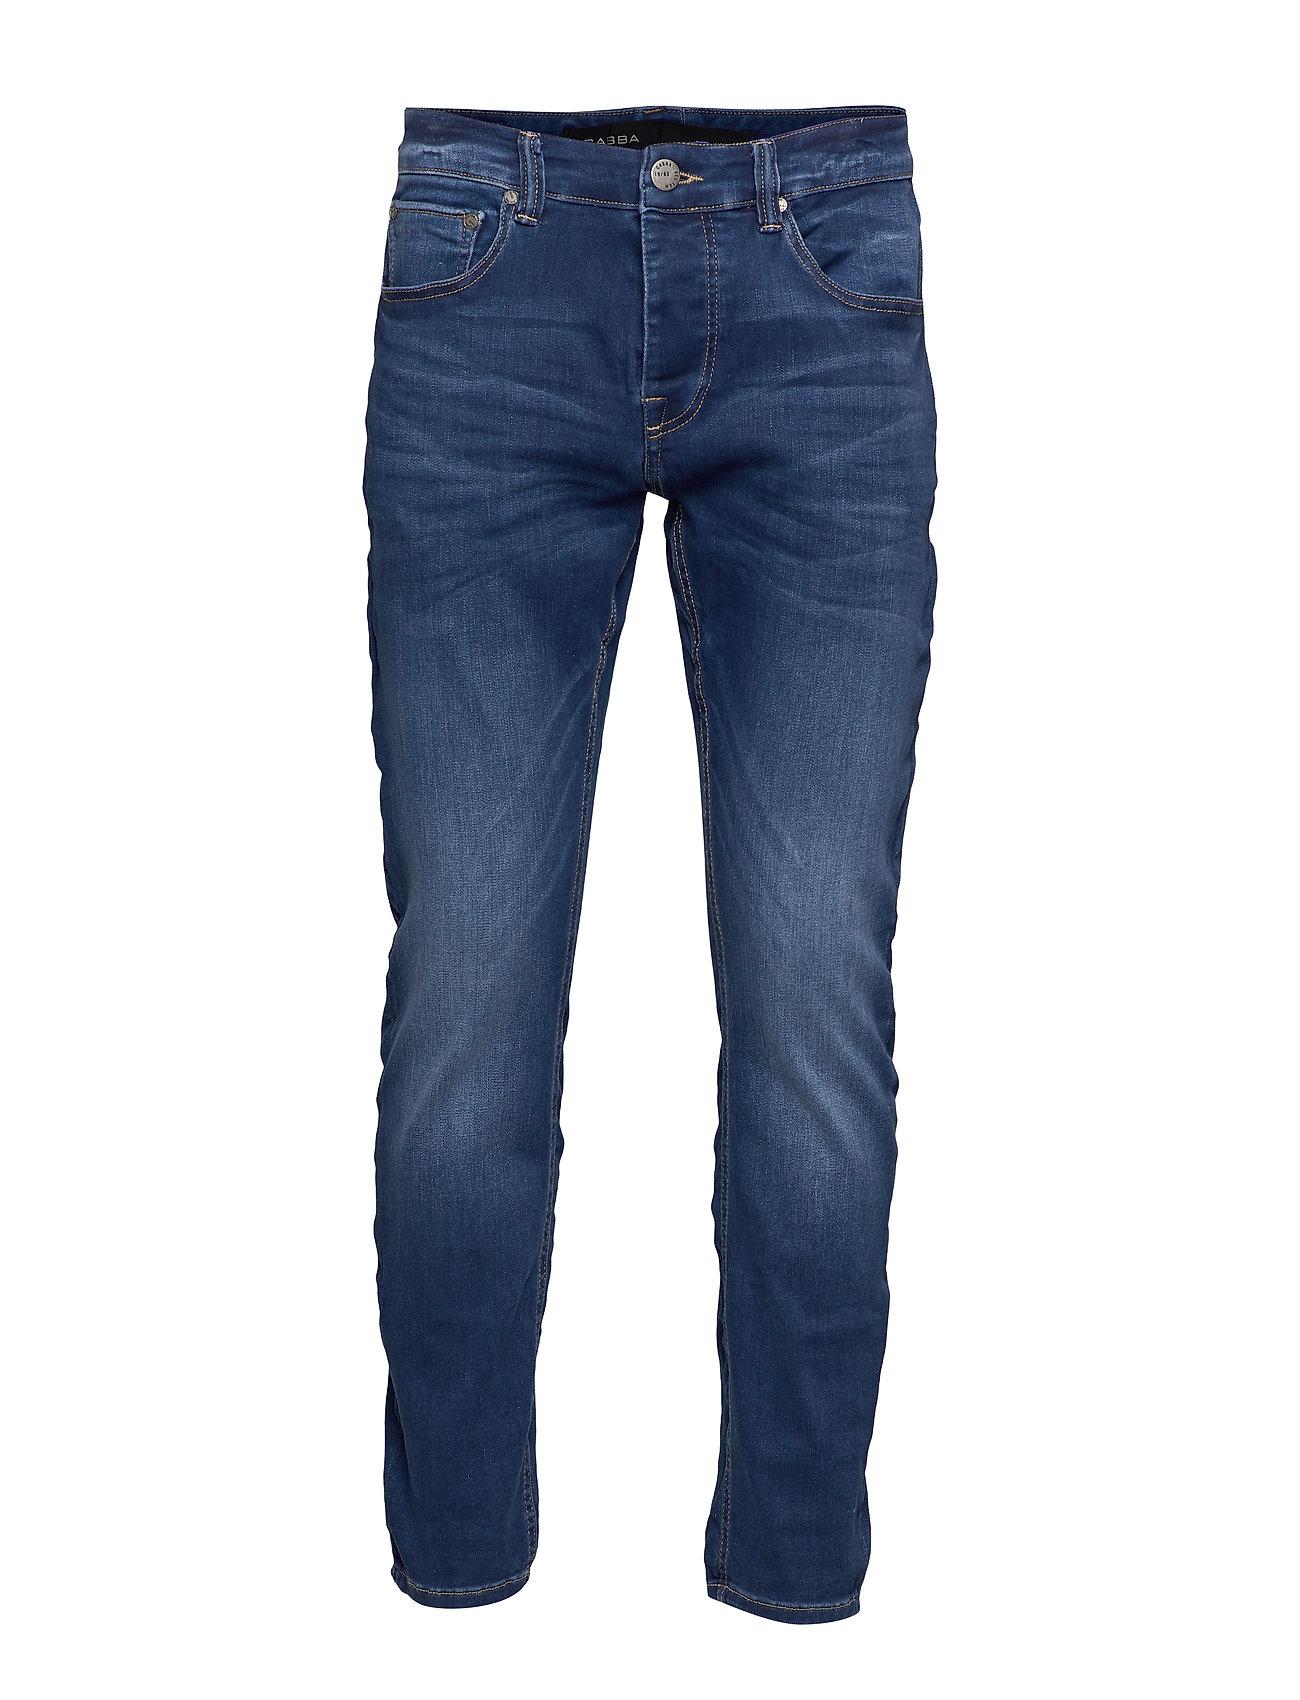 Image of J S K2213 Bright Slim Jeans Blå Gabba (3452203405)